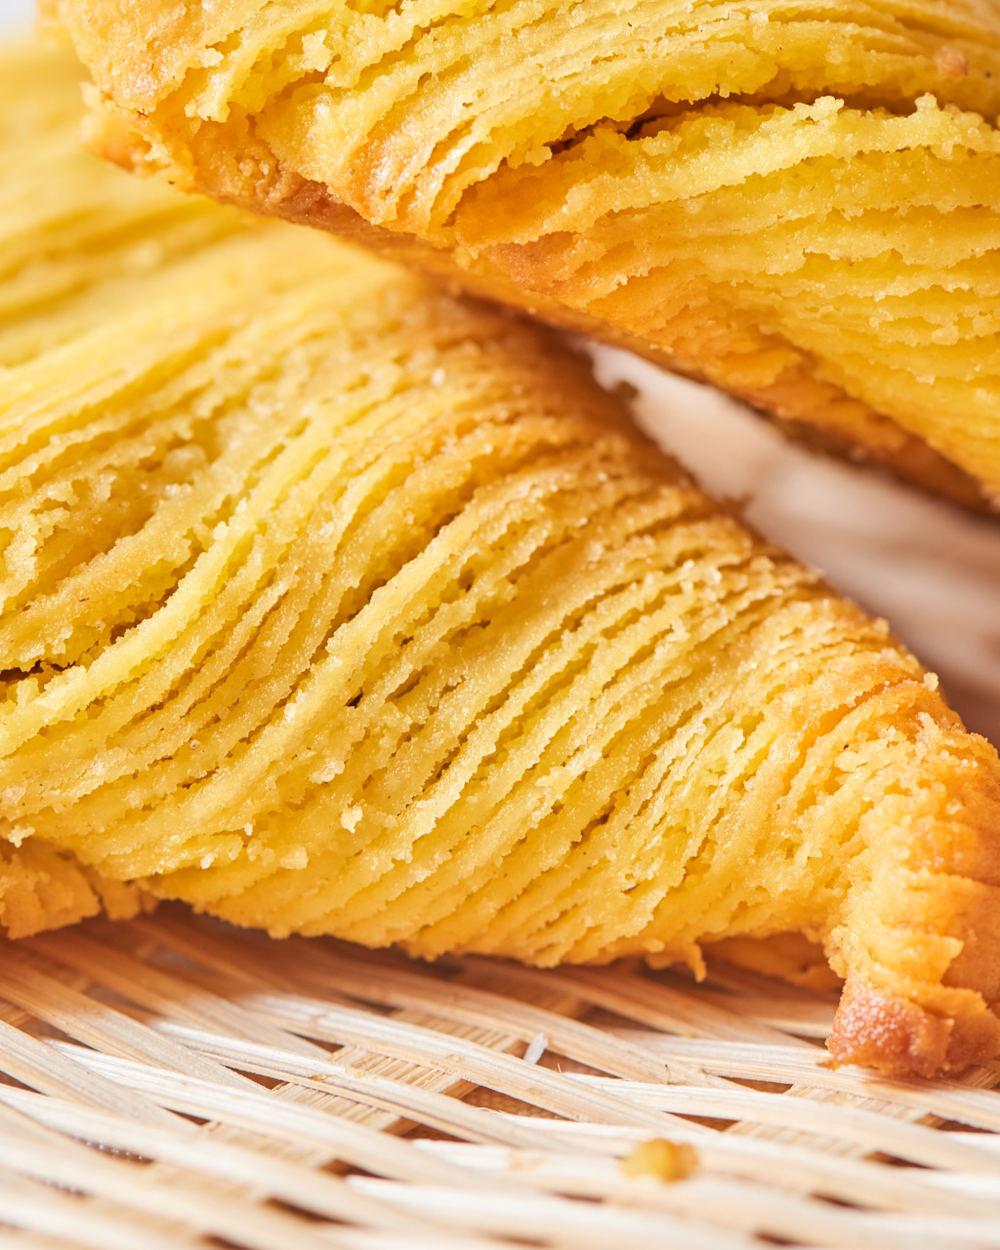 Blake food3058.jpg